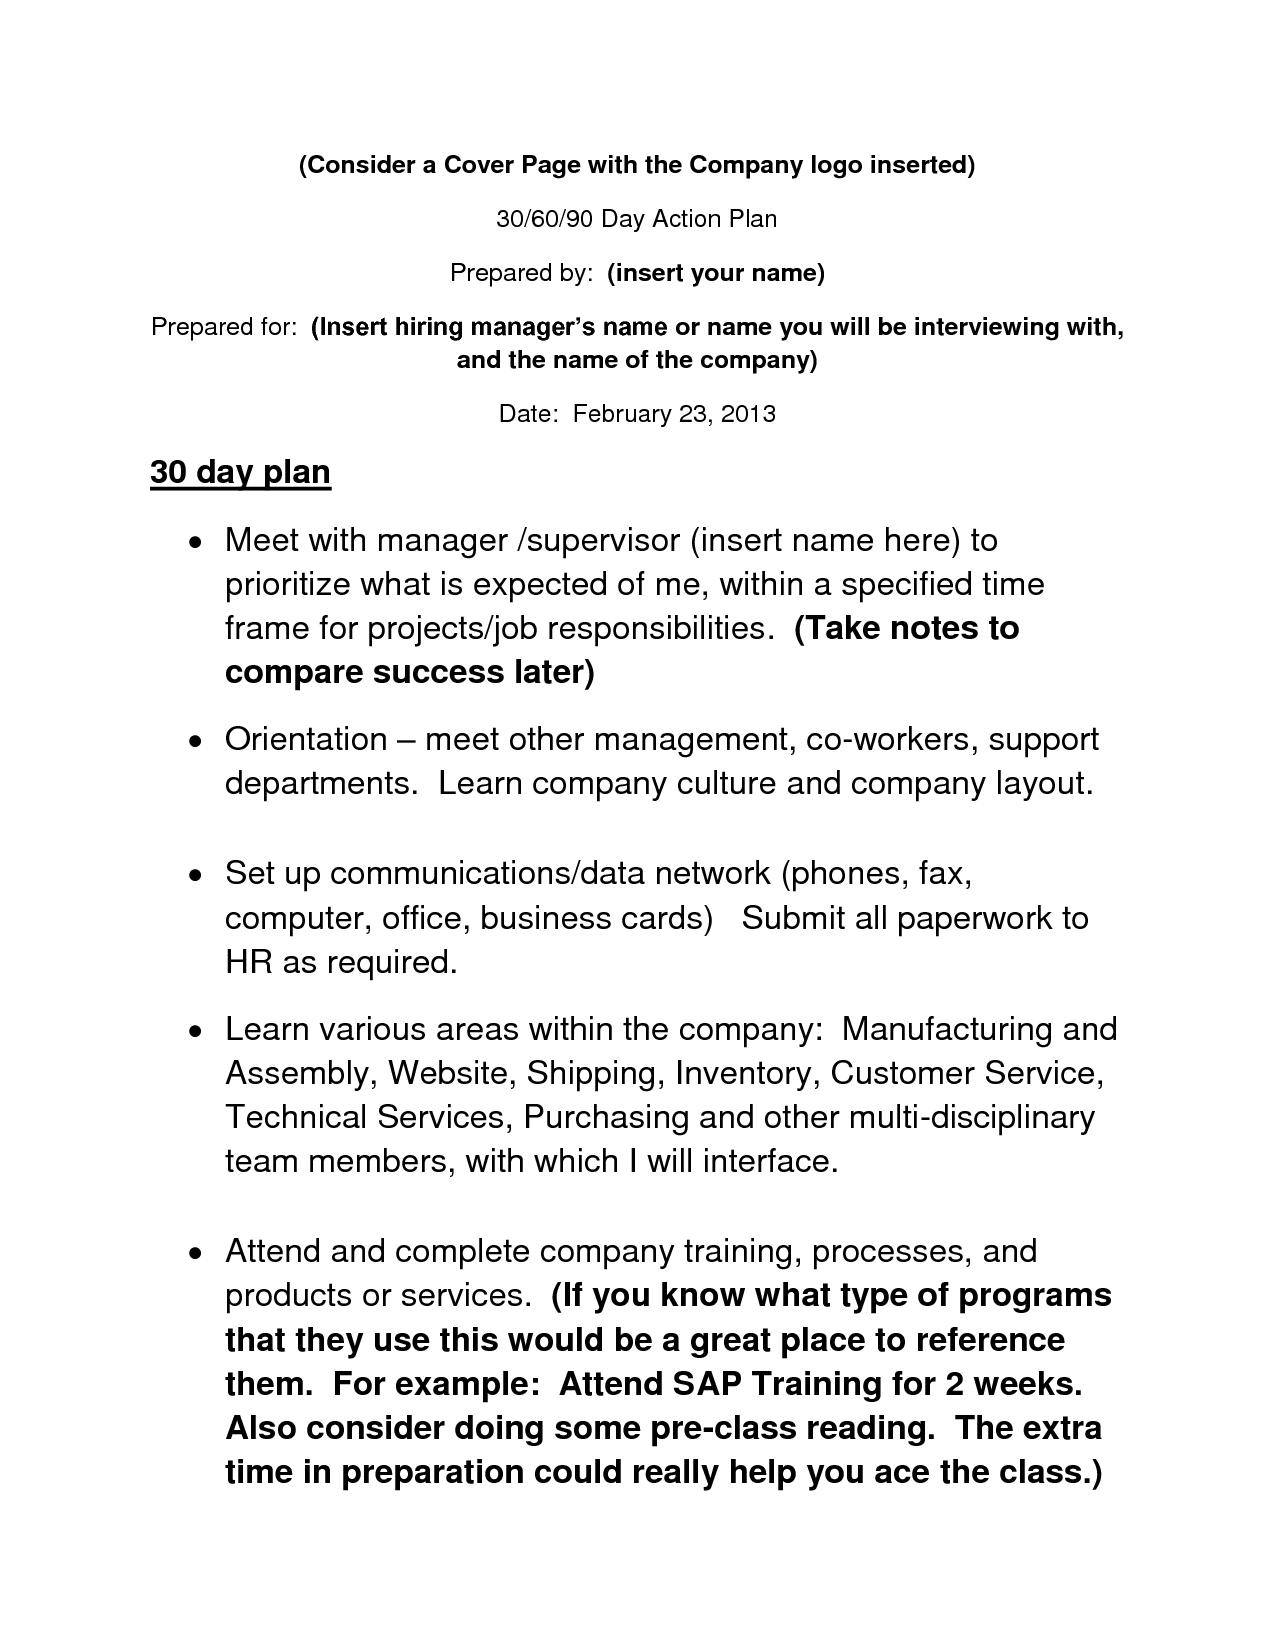 Example Of 30 60 90 Day Plan – Printable Editable Blank